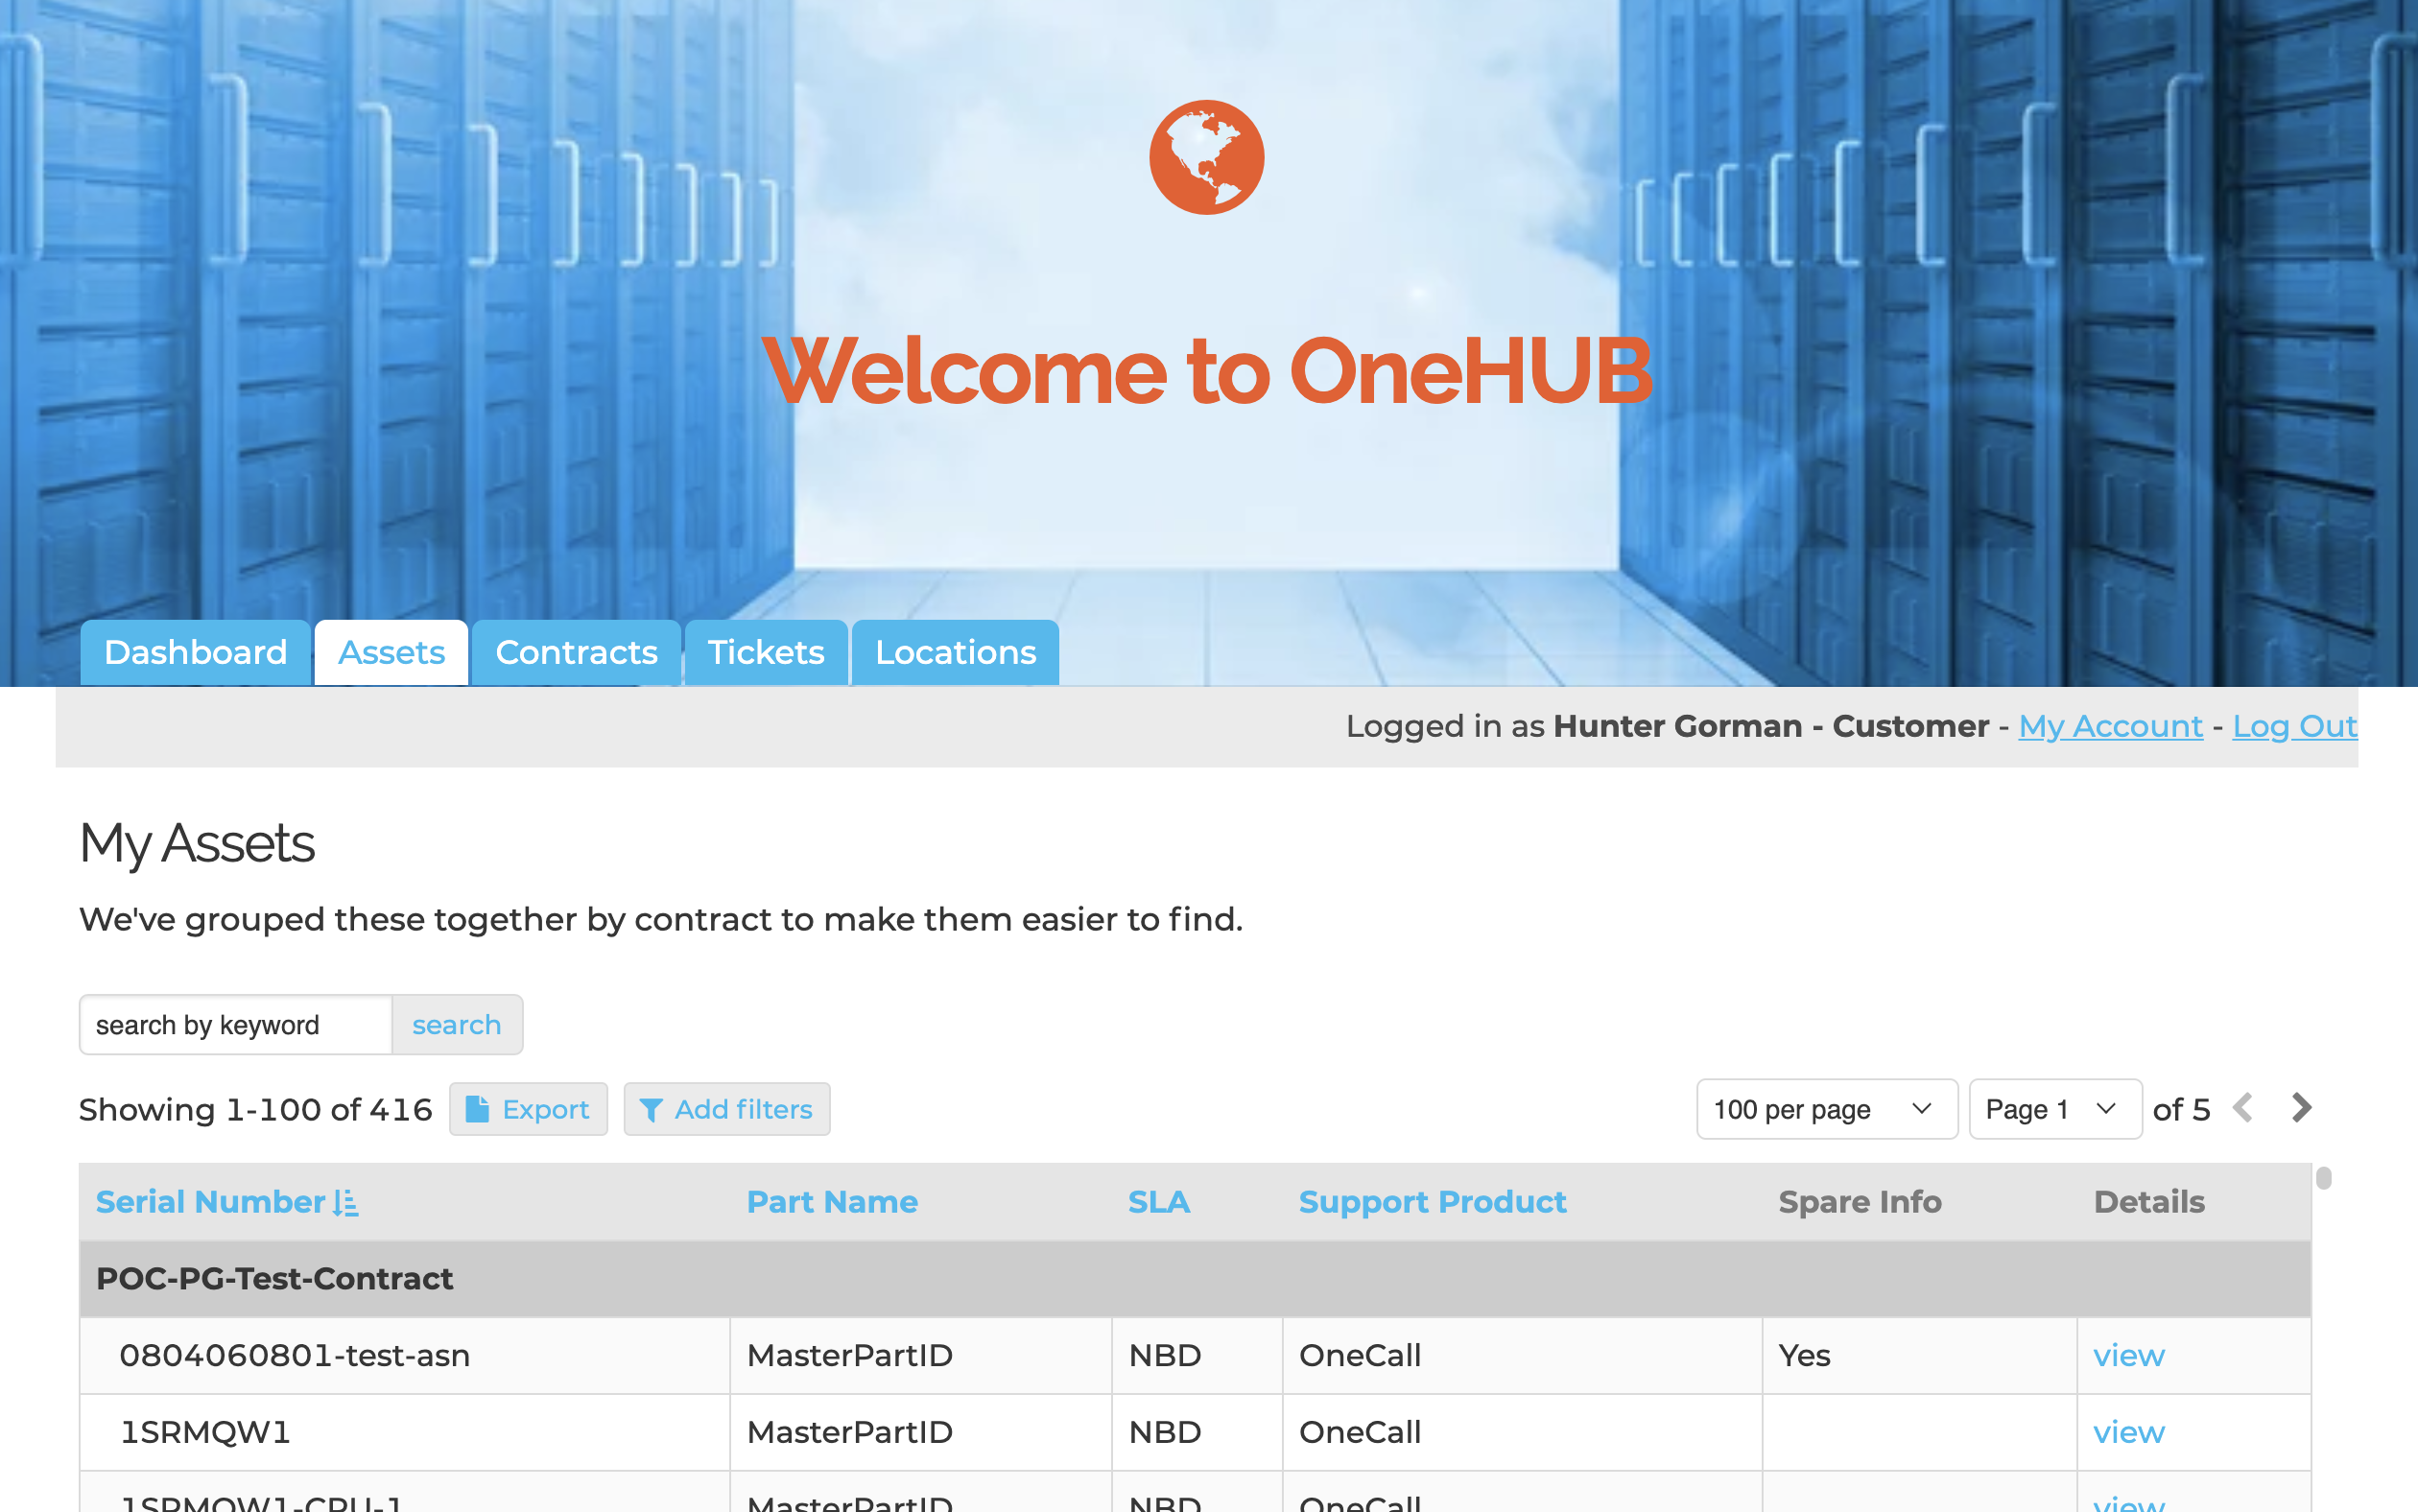 onehub-asset-management